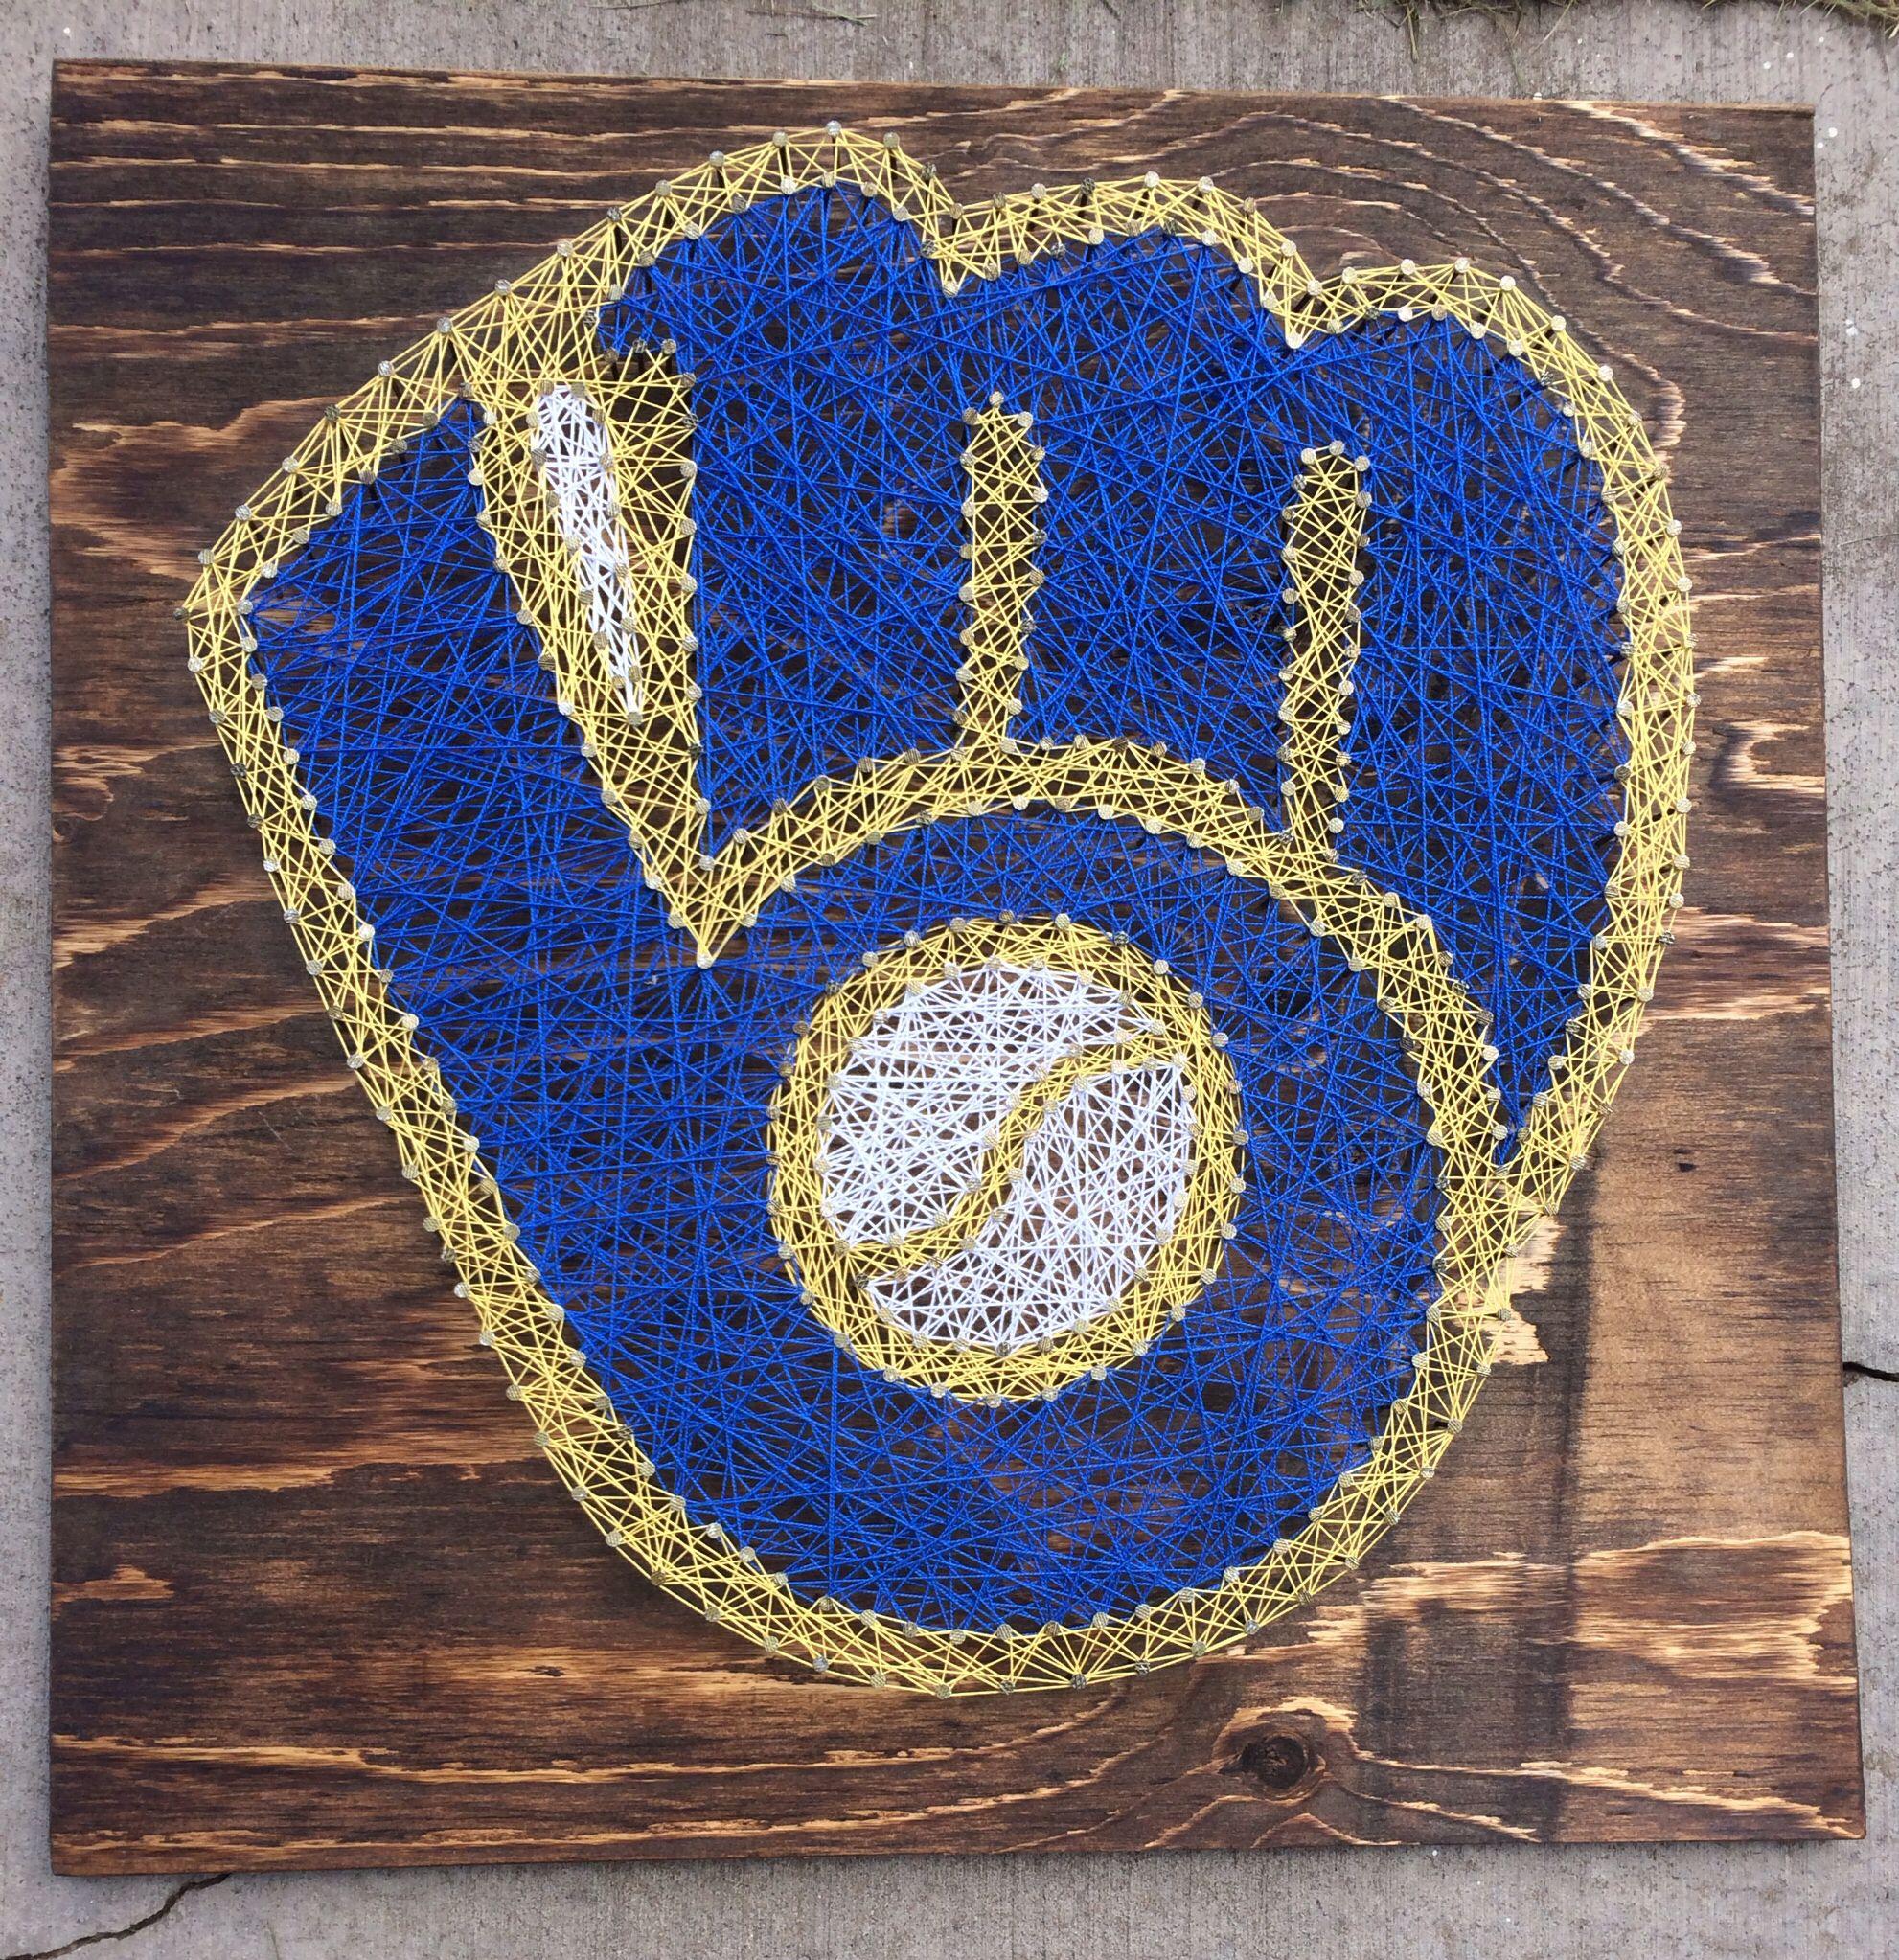 Milwaukee Brewers String Art   String Art   Pinterest   String art ...